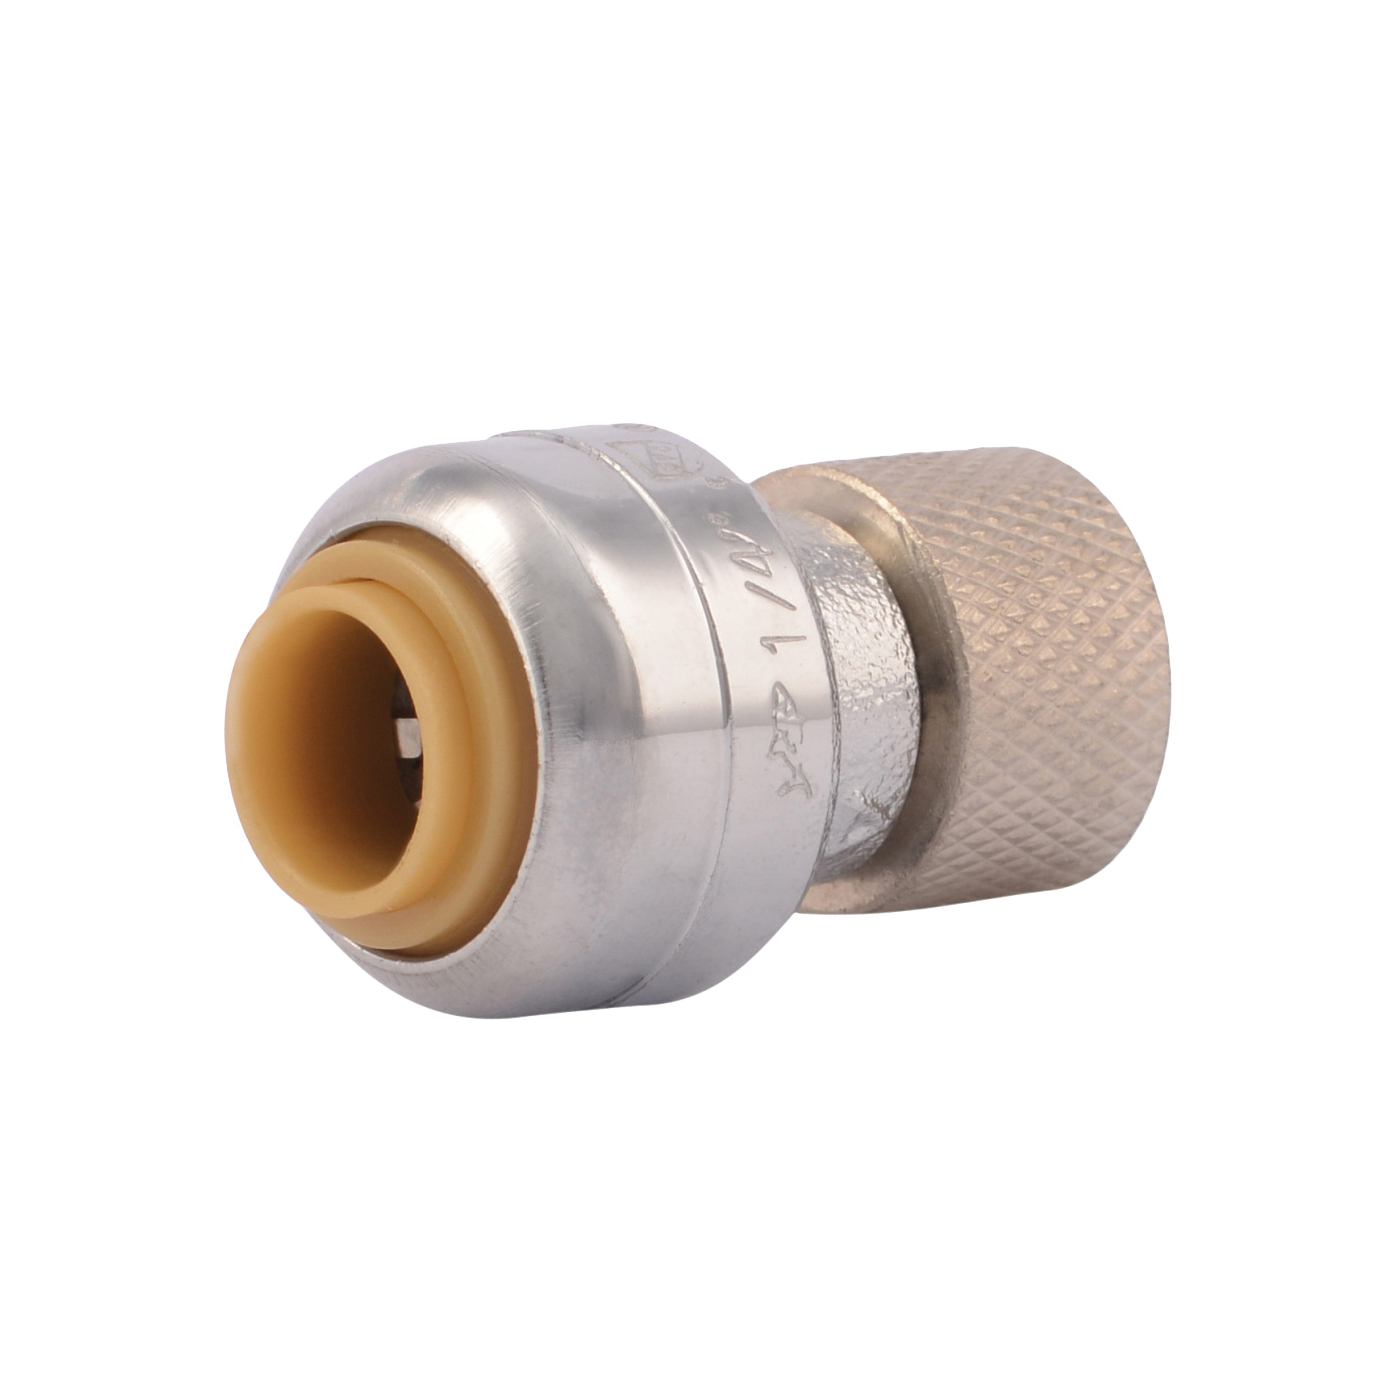 Picture of SharkBite U3523LFA Pipe Connector, 1/4 x 3/8 in, Compression, Brass, 200 psi Pressure